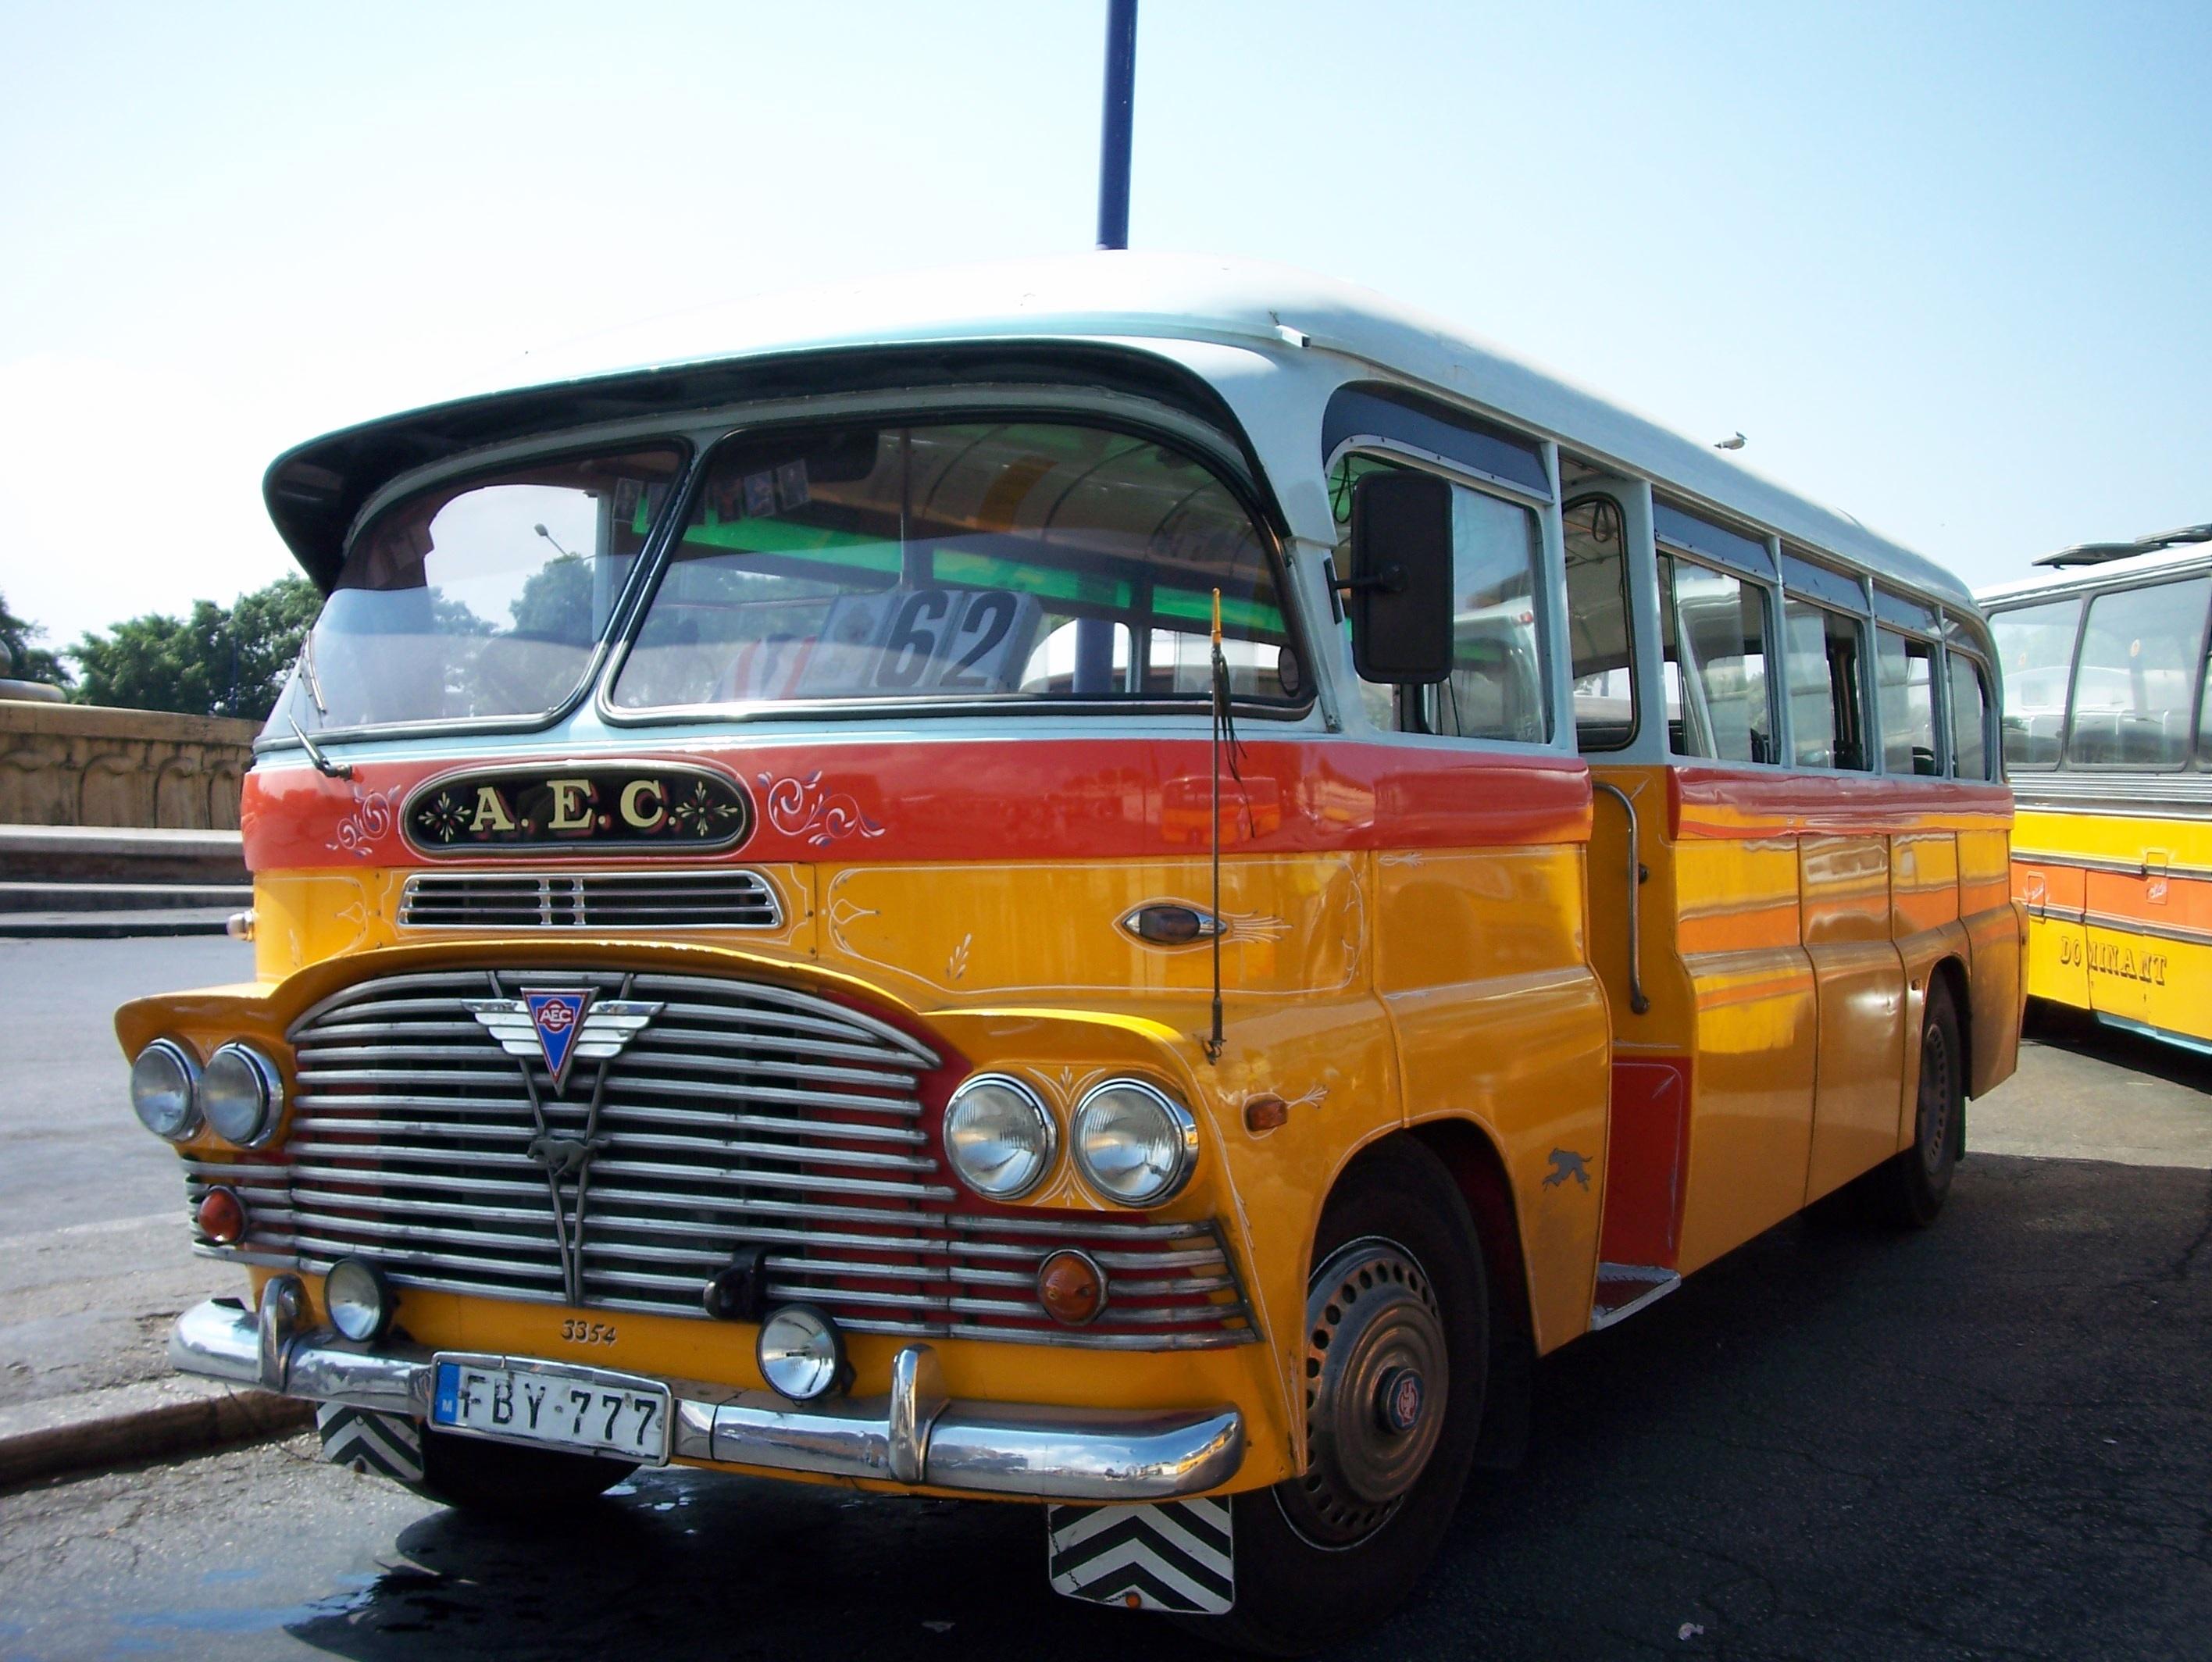 AEC buses